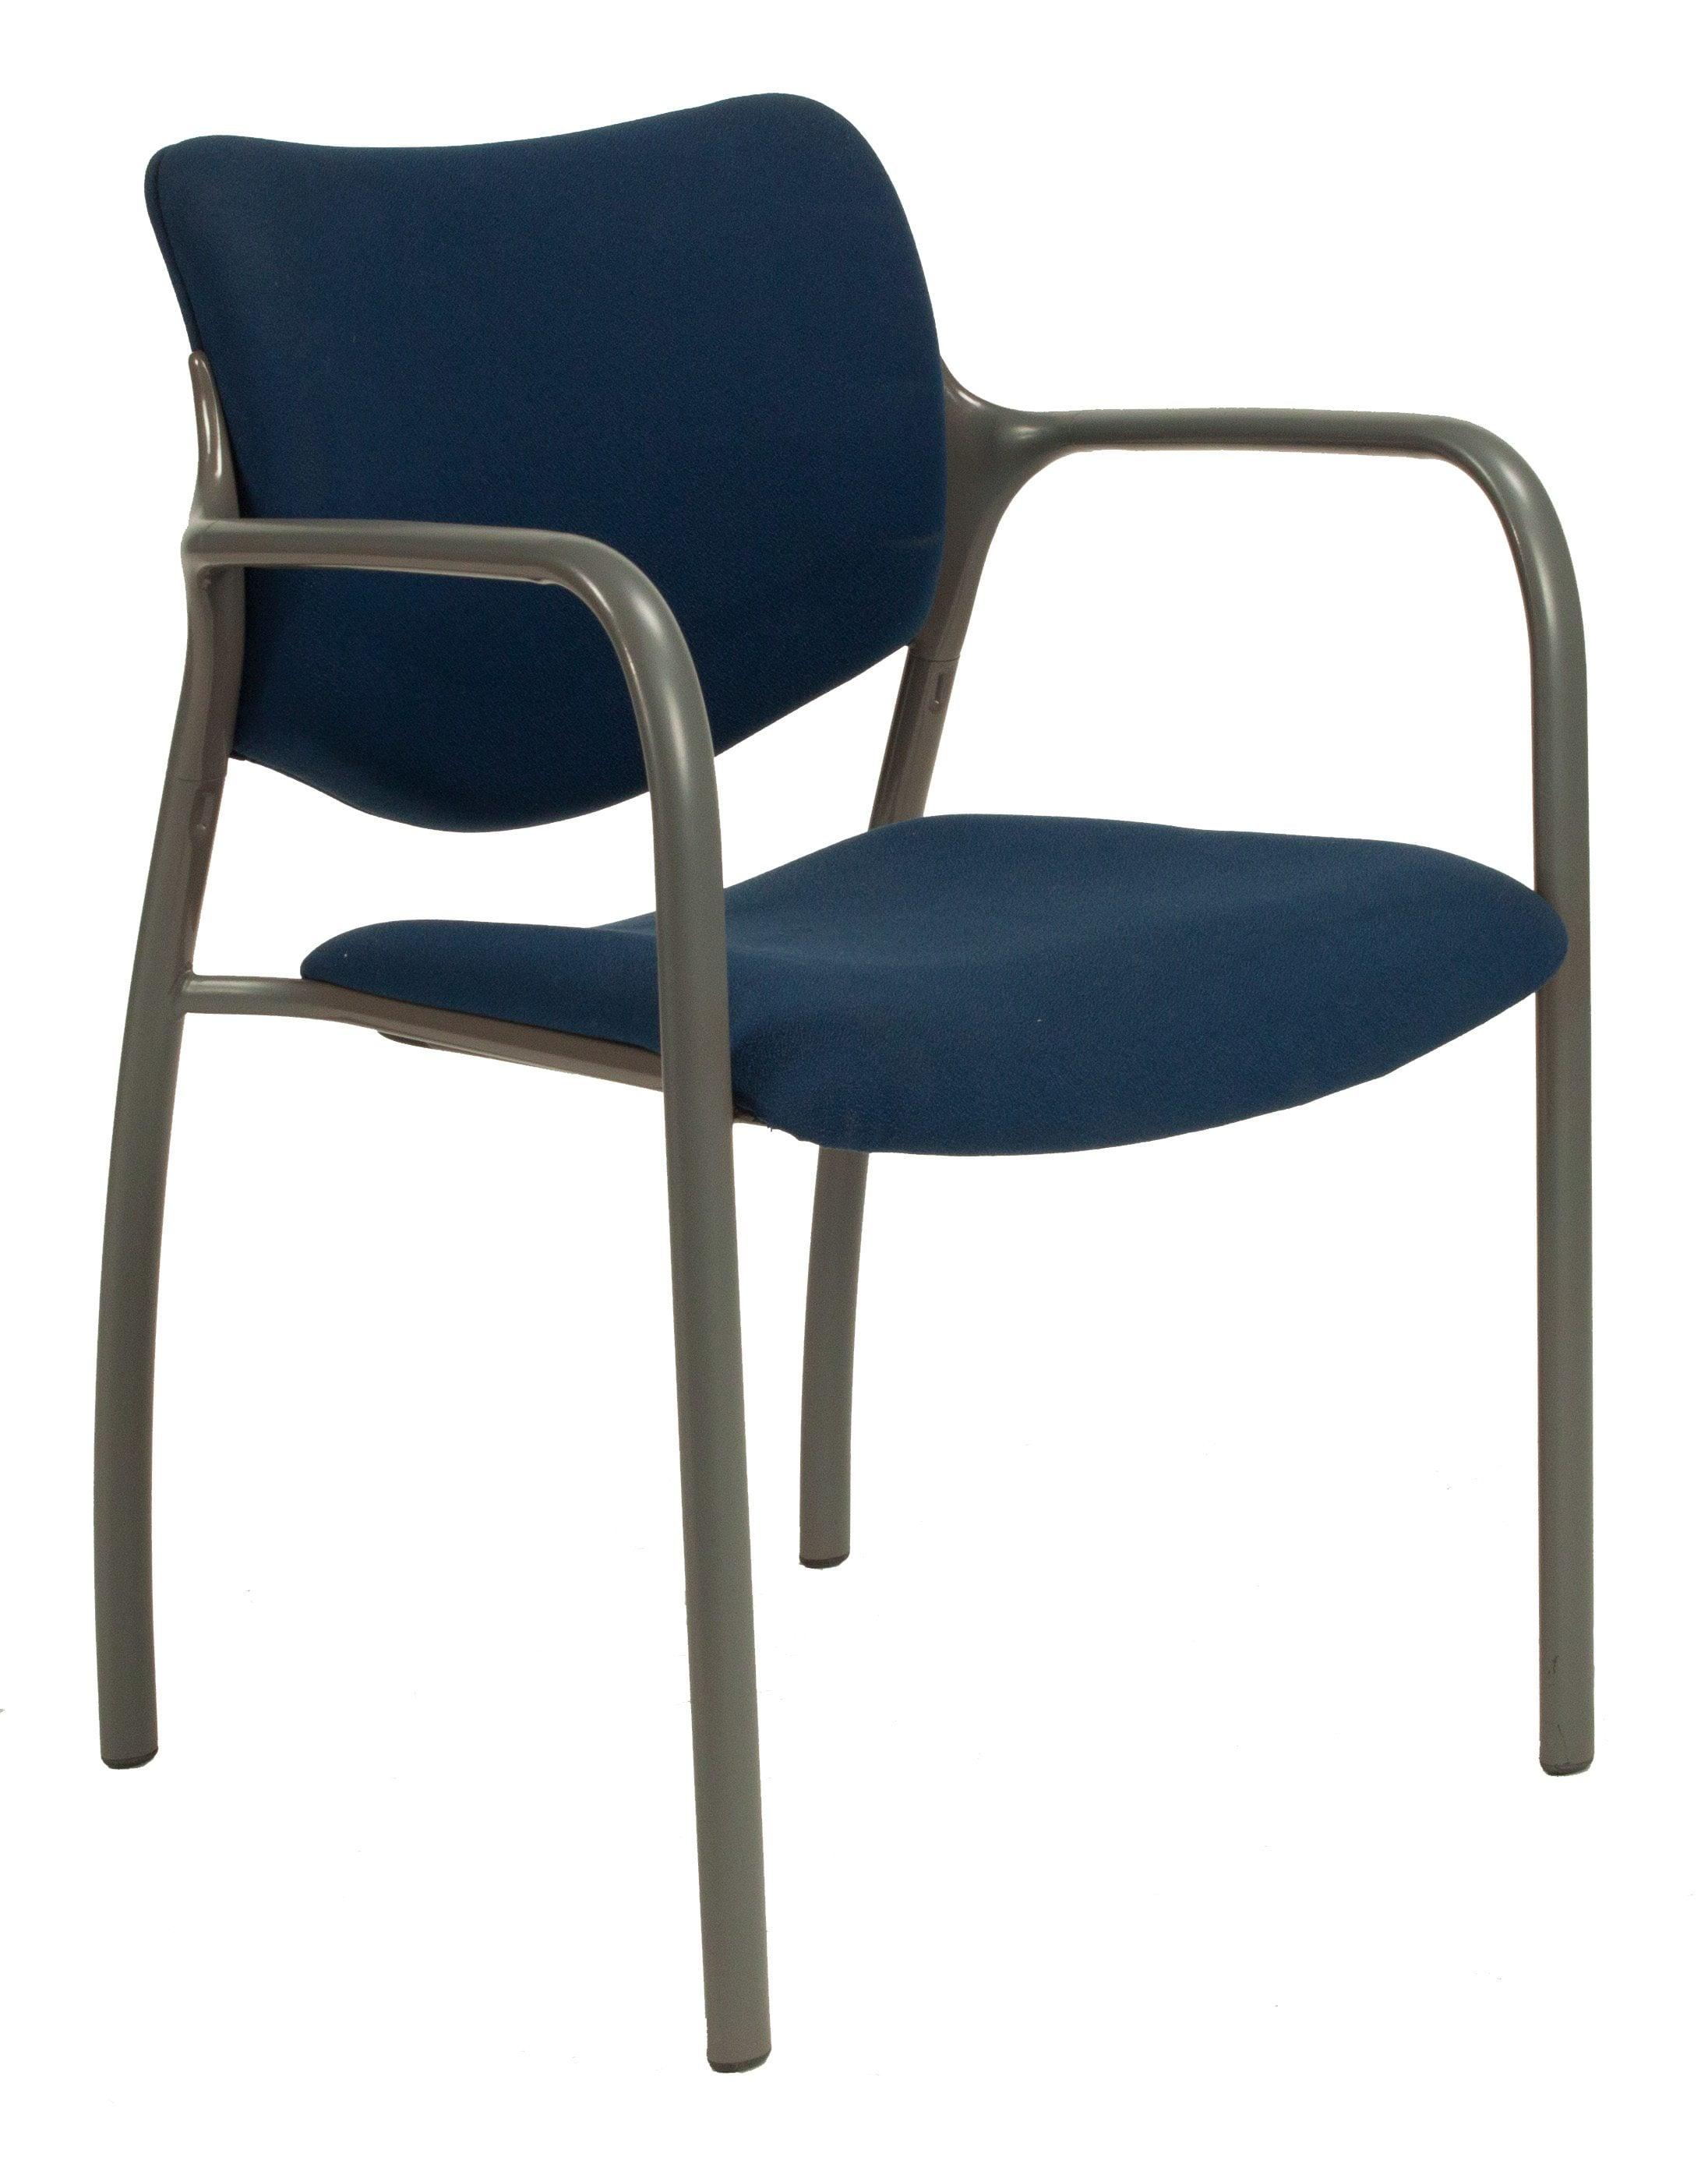 Herman Miller Plastic Chair herman miller eames shell chair